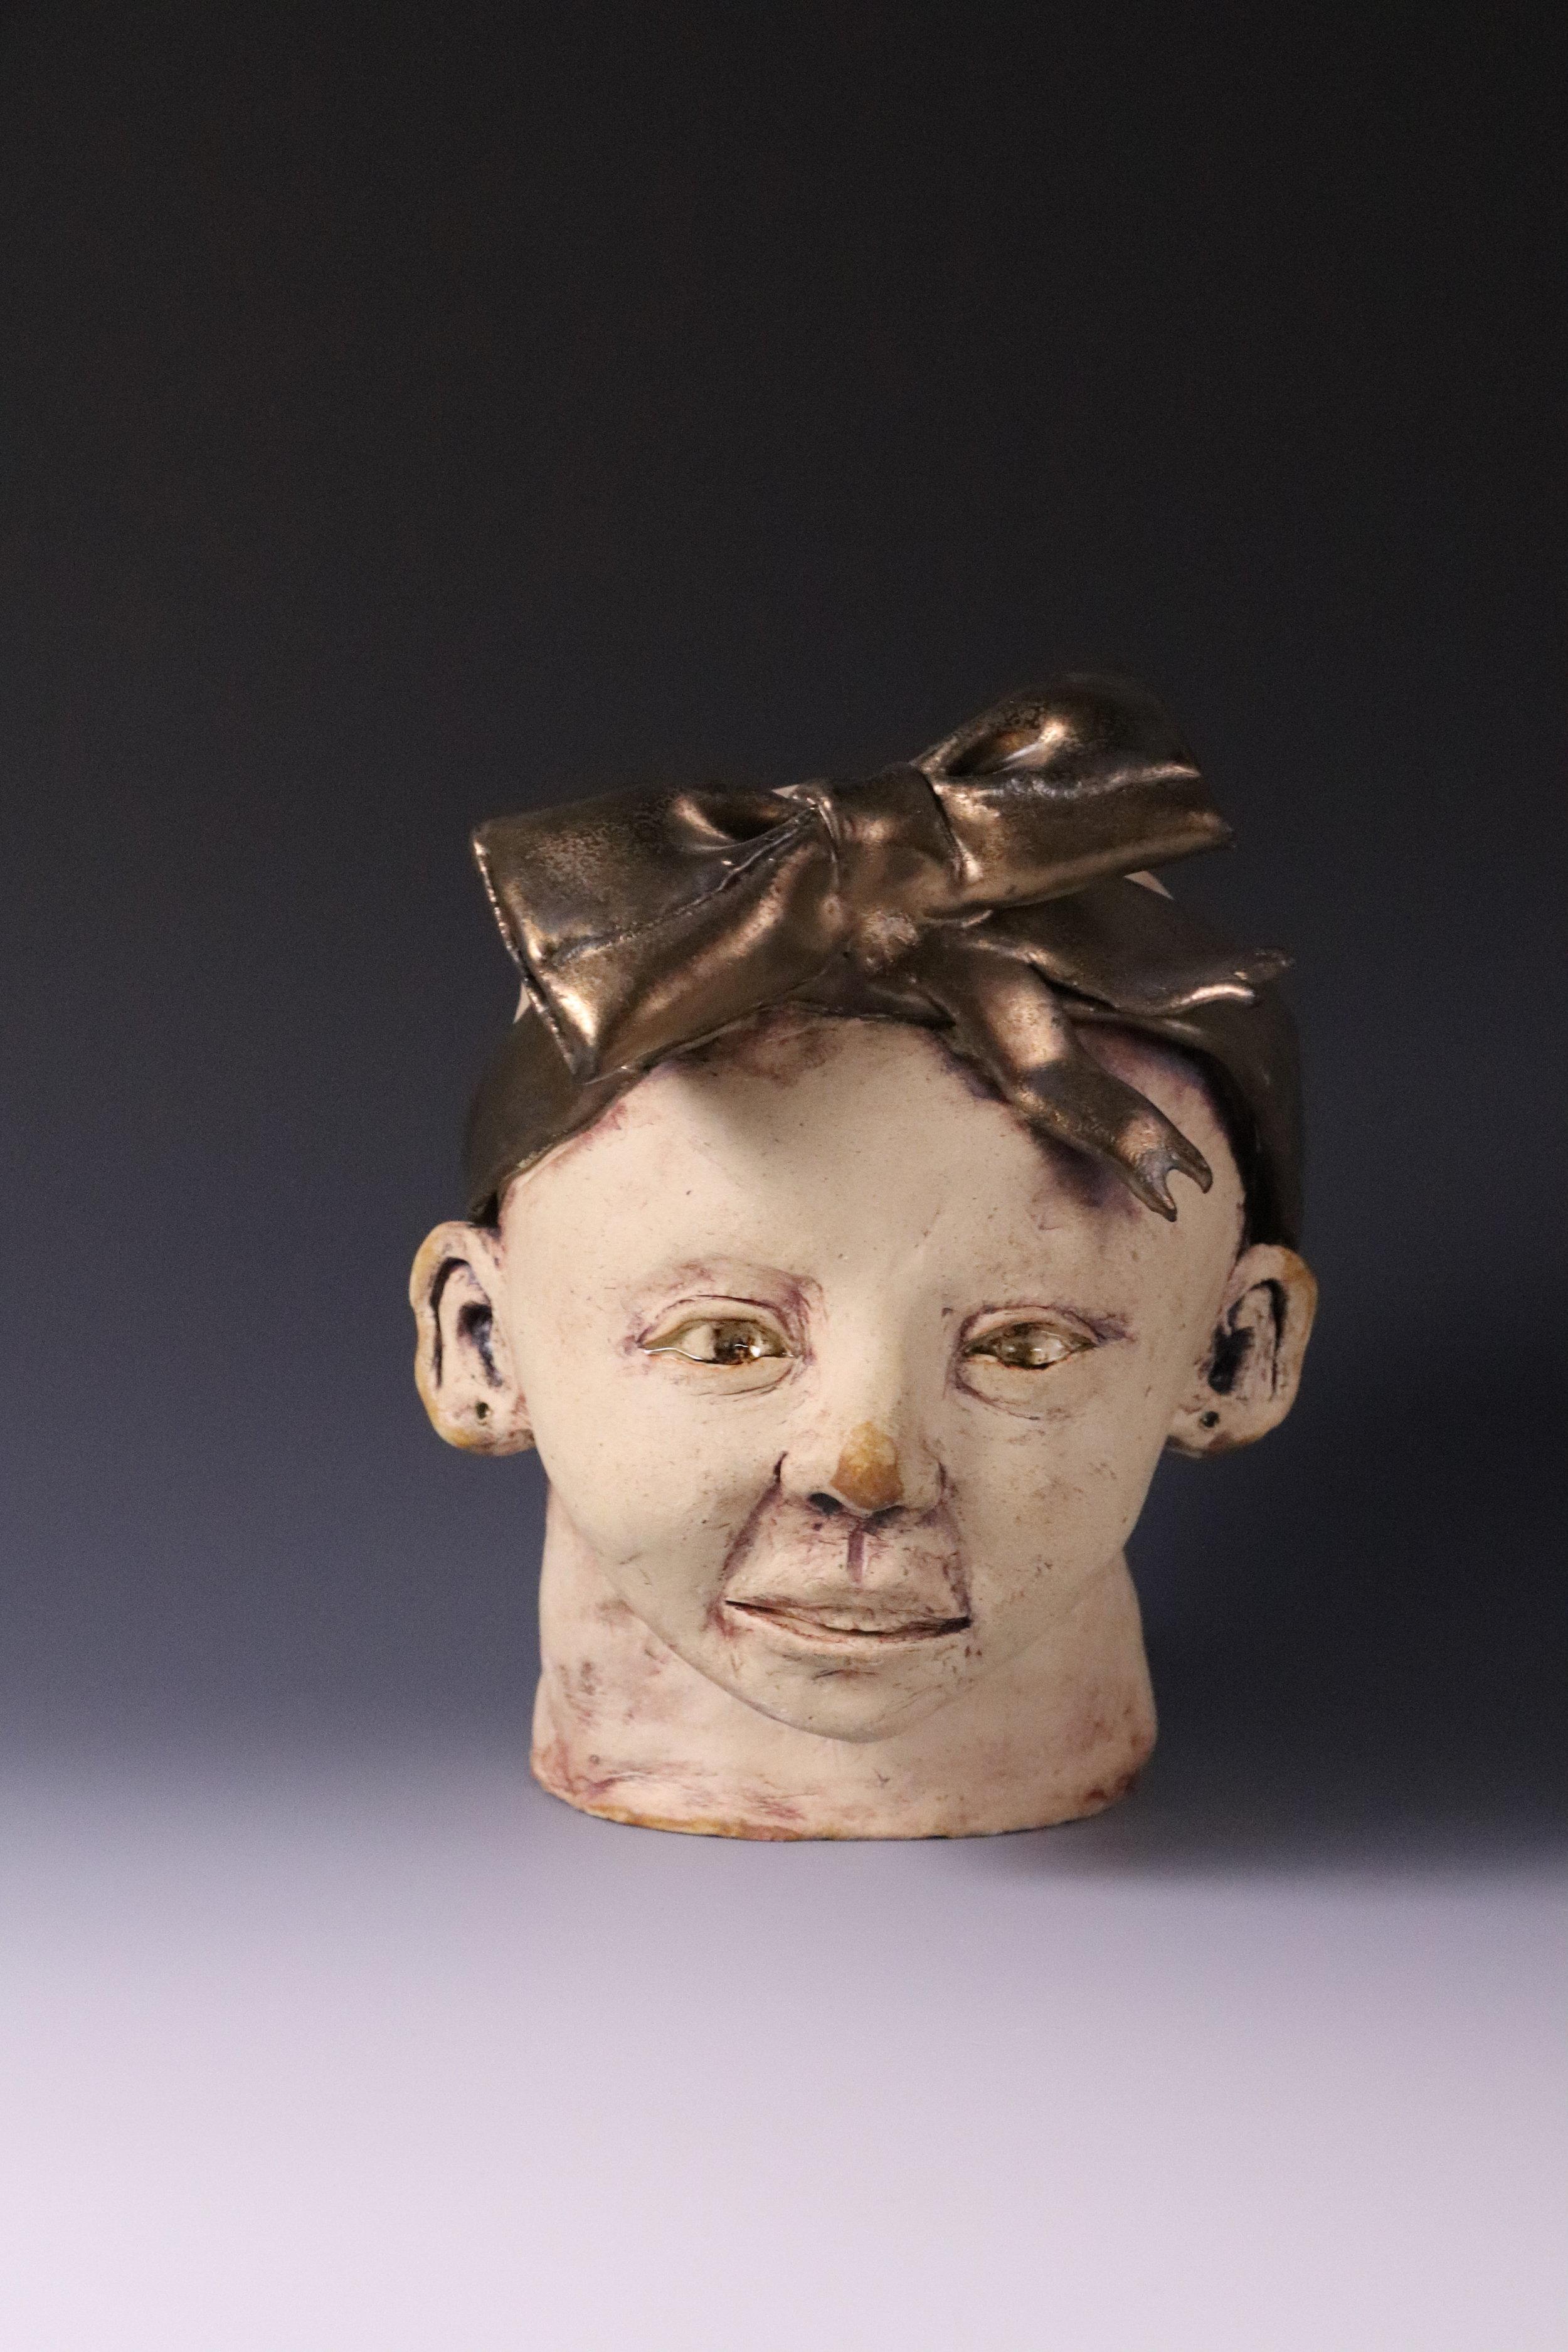 Kaitlyn_2622_ceramic3_Rosales.JPG